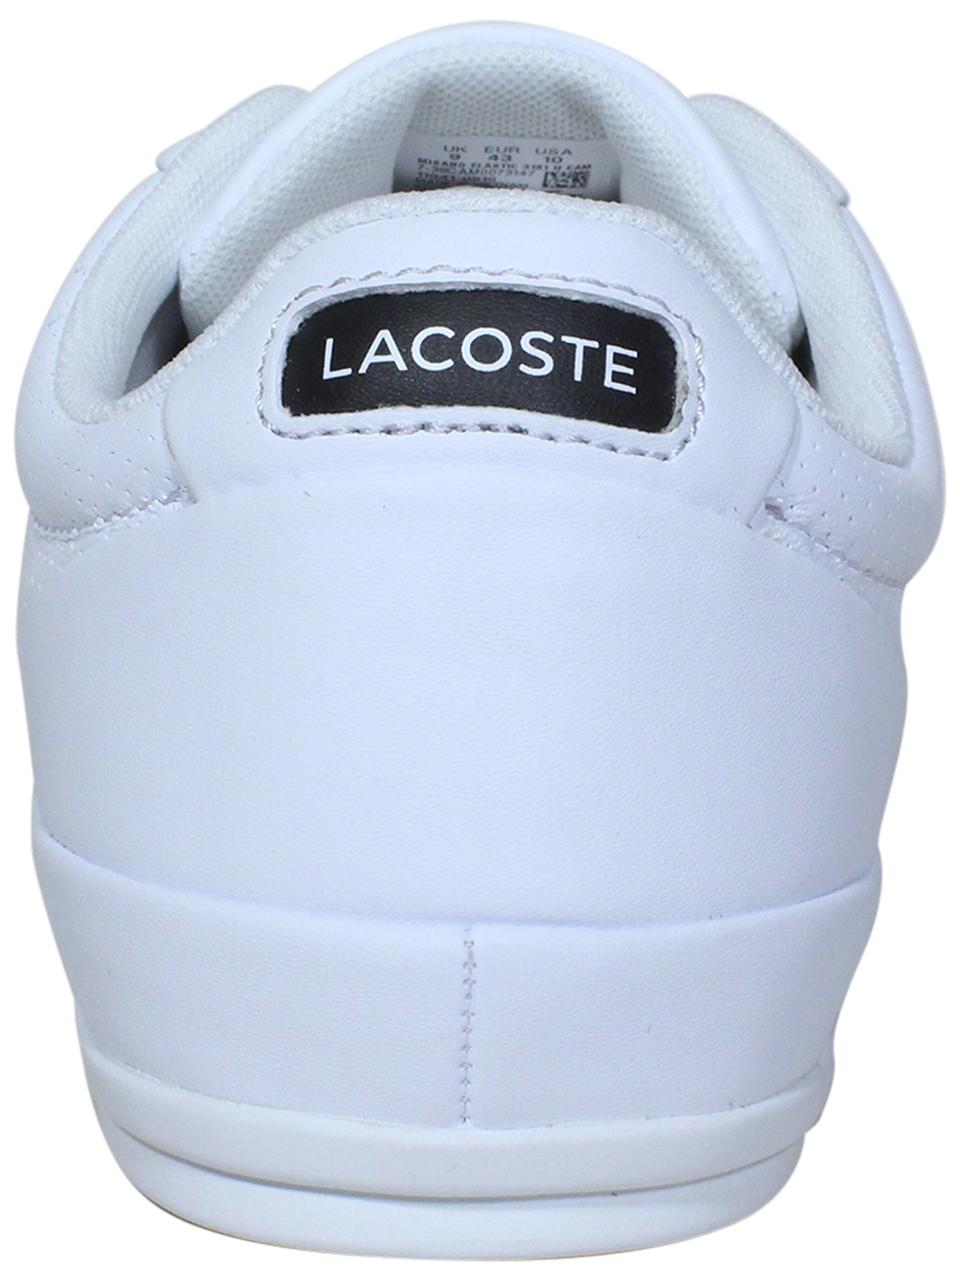 Lacoste-Misano-Elastic-318-Sneakers-Men-039-s-Low-Top-Shoes thumbnail 25